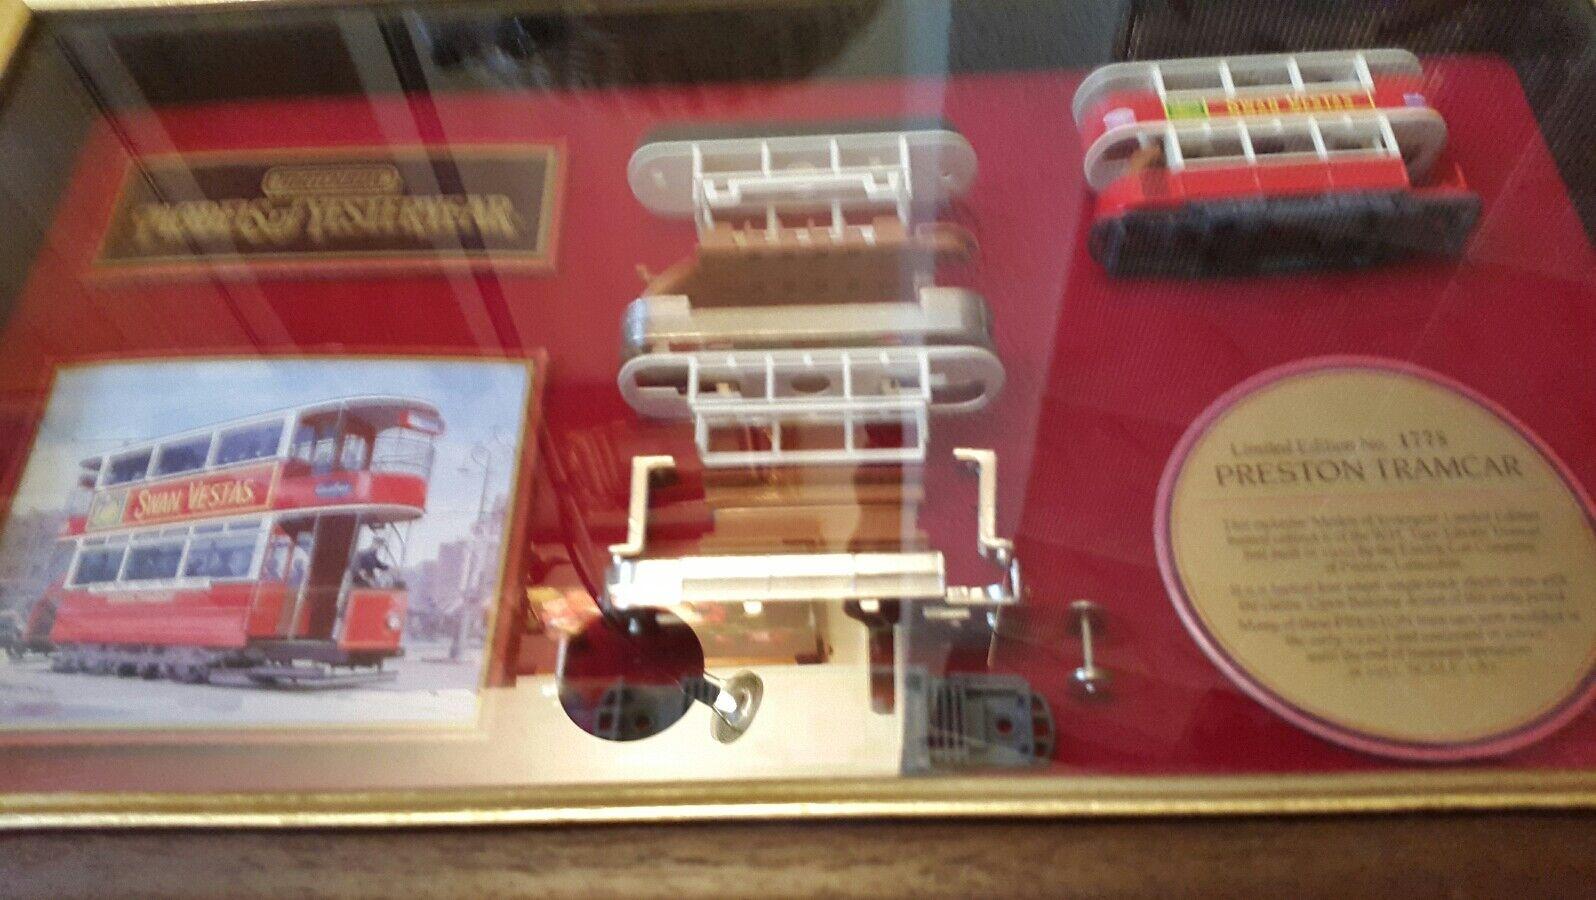 Matchbox. Matchbox. Matchbox. models of Yesterday. Preston tramcar.no 1778 e0ec70